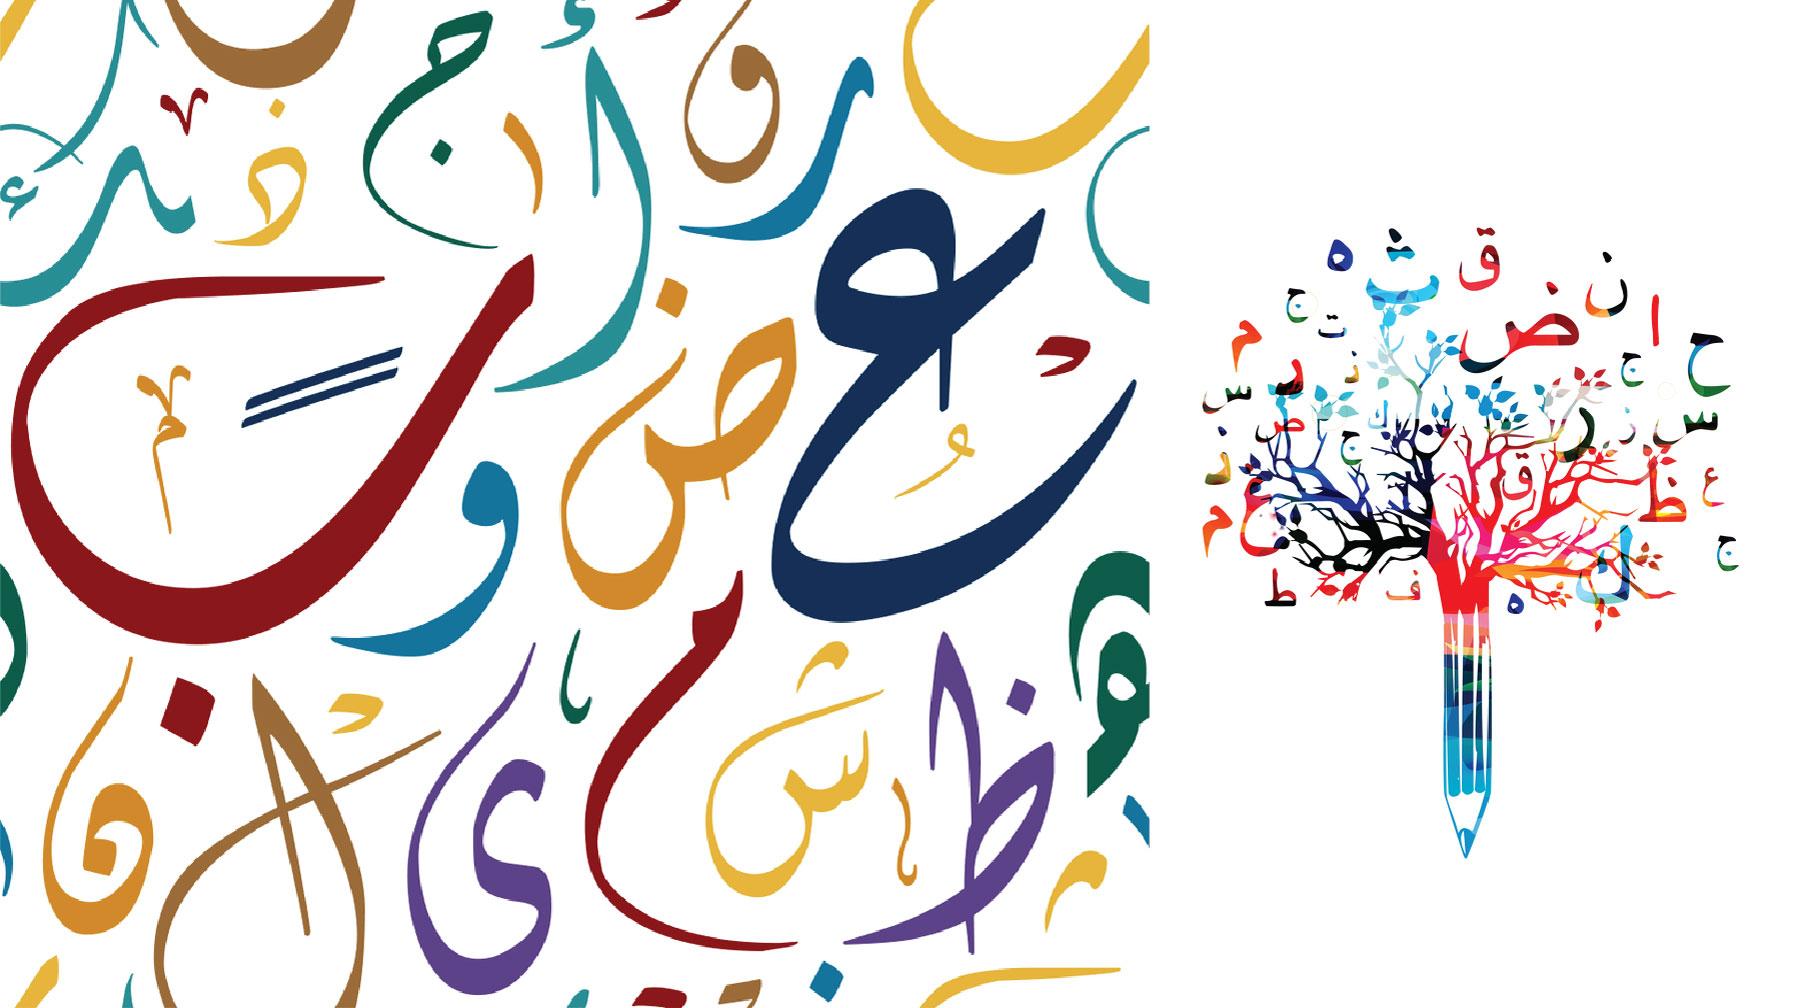 Basic Arabic Language & Grammar Course